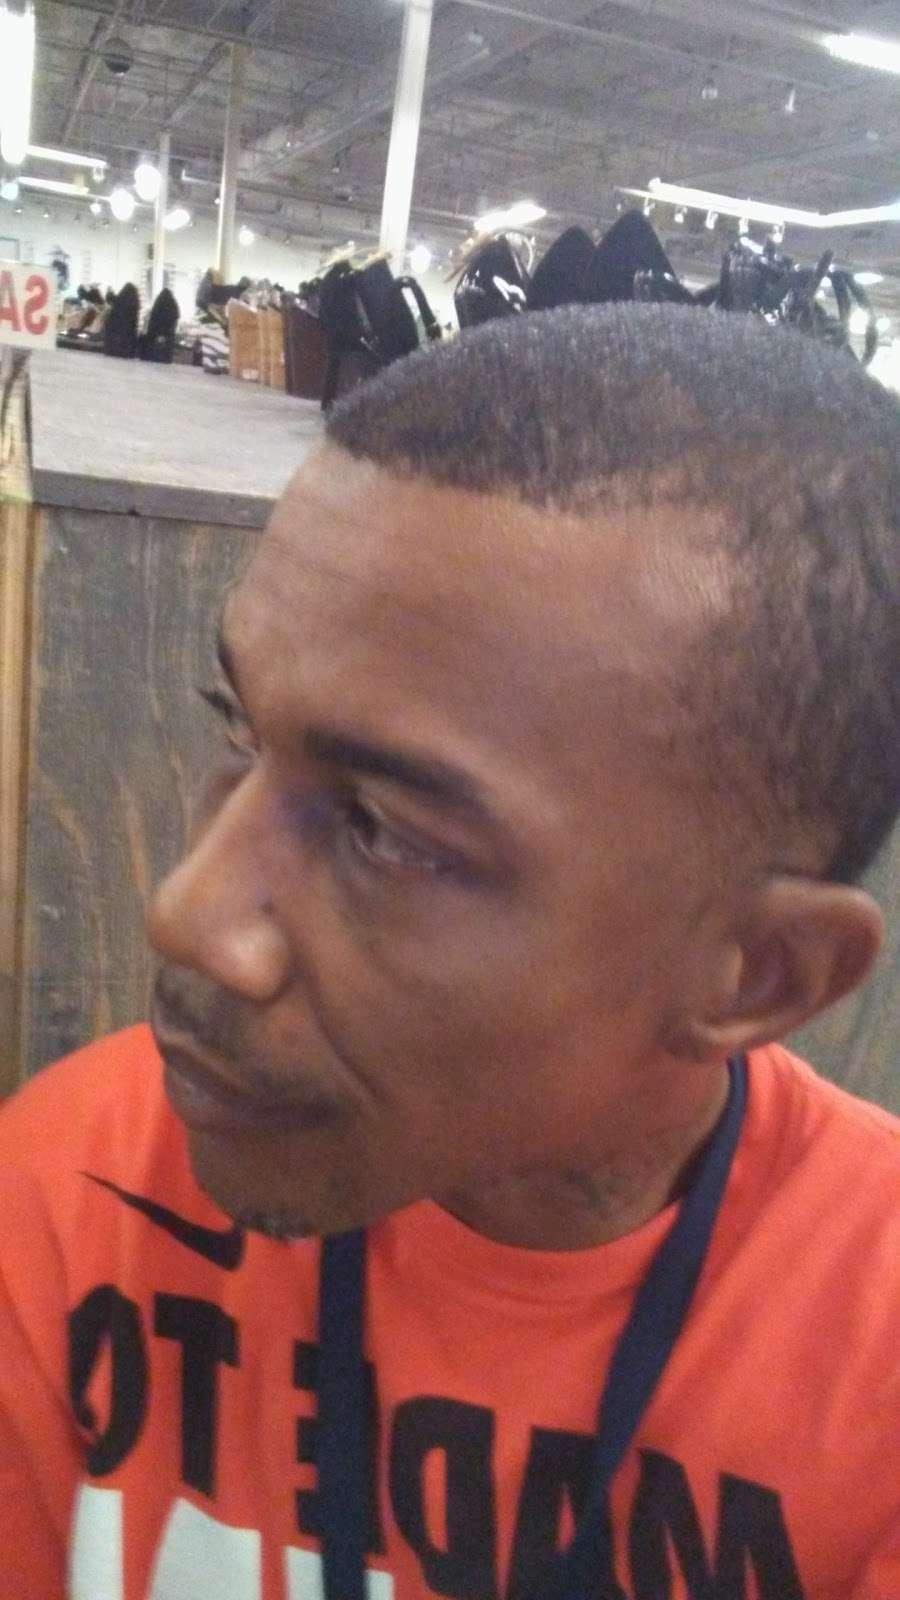 Rainbow - shoe store  | Photo 1 of 8 | Address: 3662 W Camp Wisdom Rd, Dallas, TX 75237, USA | Phone: (972) 709-1536